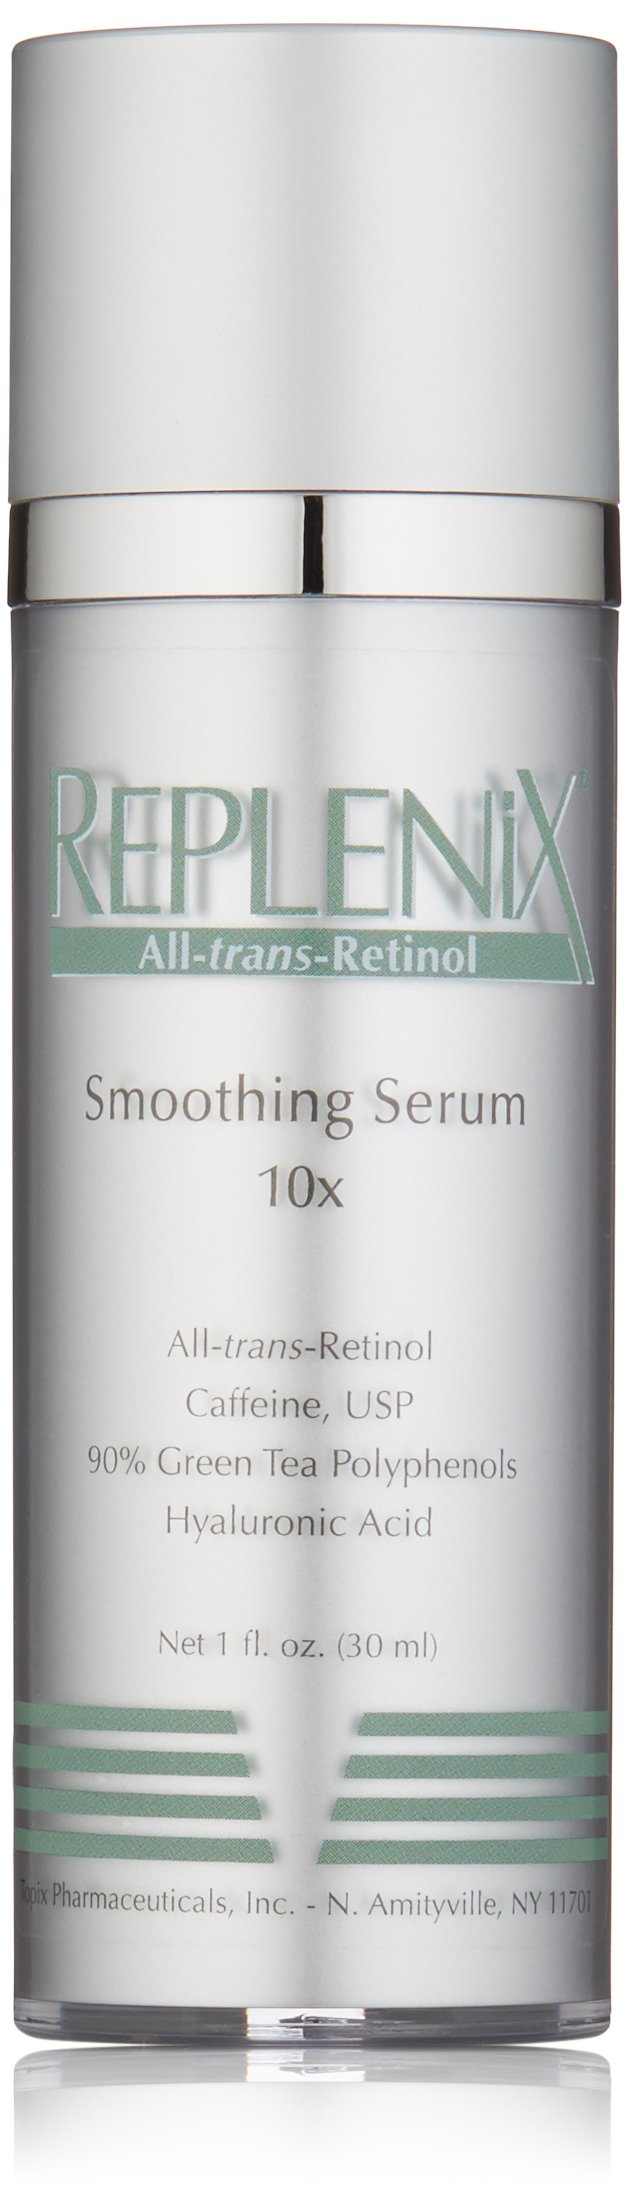 Replenix All-trans-Retinol Smoothing Face Serum 10X for Wrinkles, Fine Lines, with Retinol, Green Tea, and Caffeine, 1 Oz